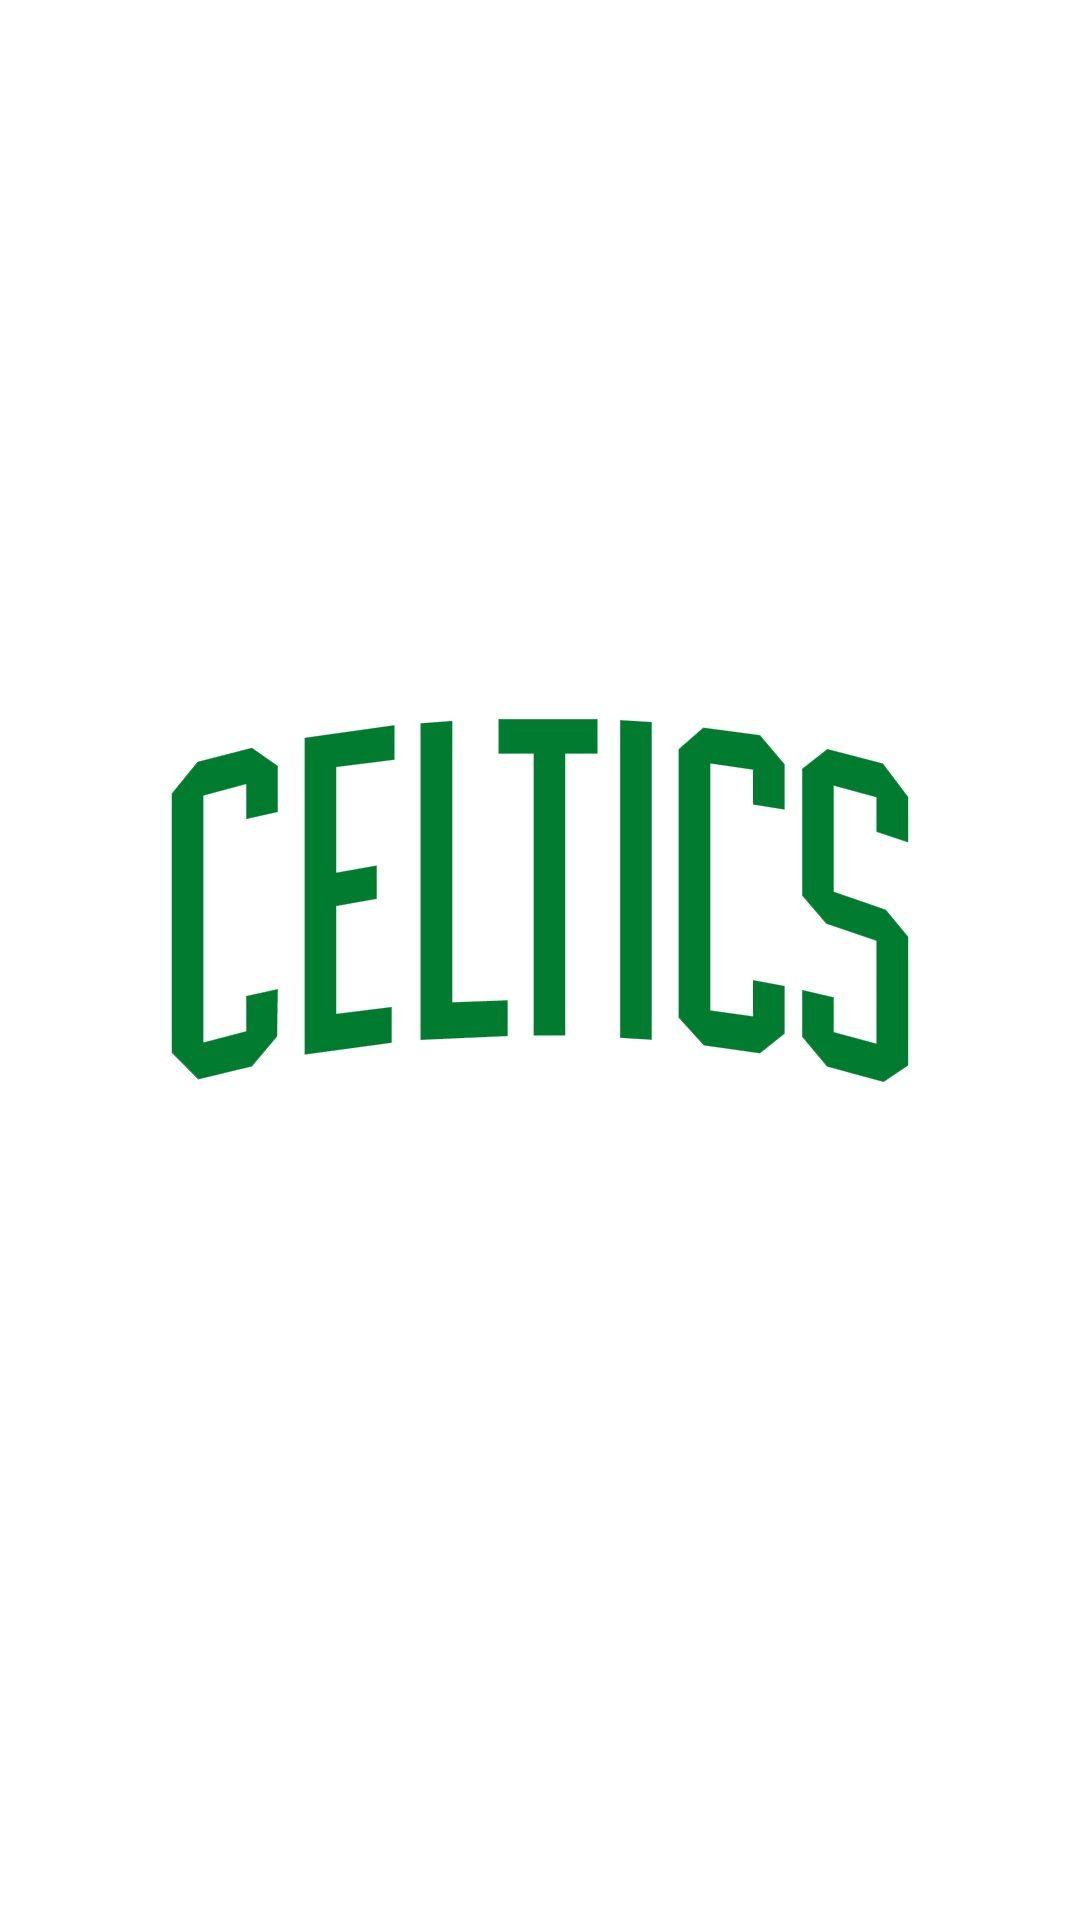 Pin By Filipe Vieira Sabino On Boston Celtics Boston Celtics Logo Nba Quotes Boston Celtics